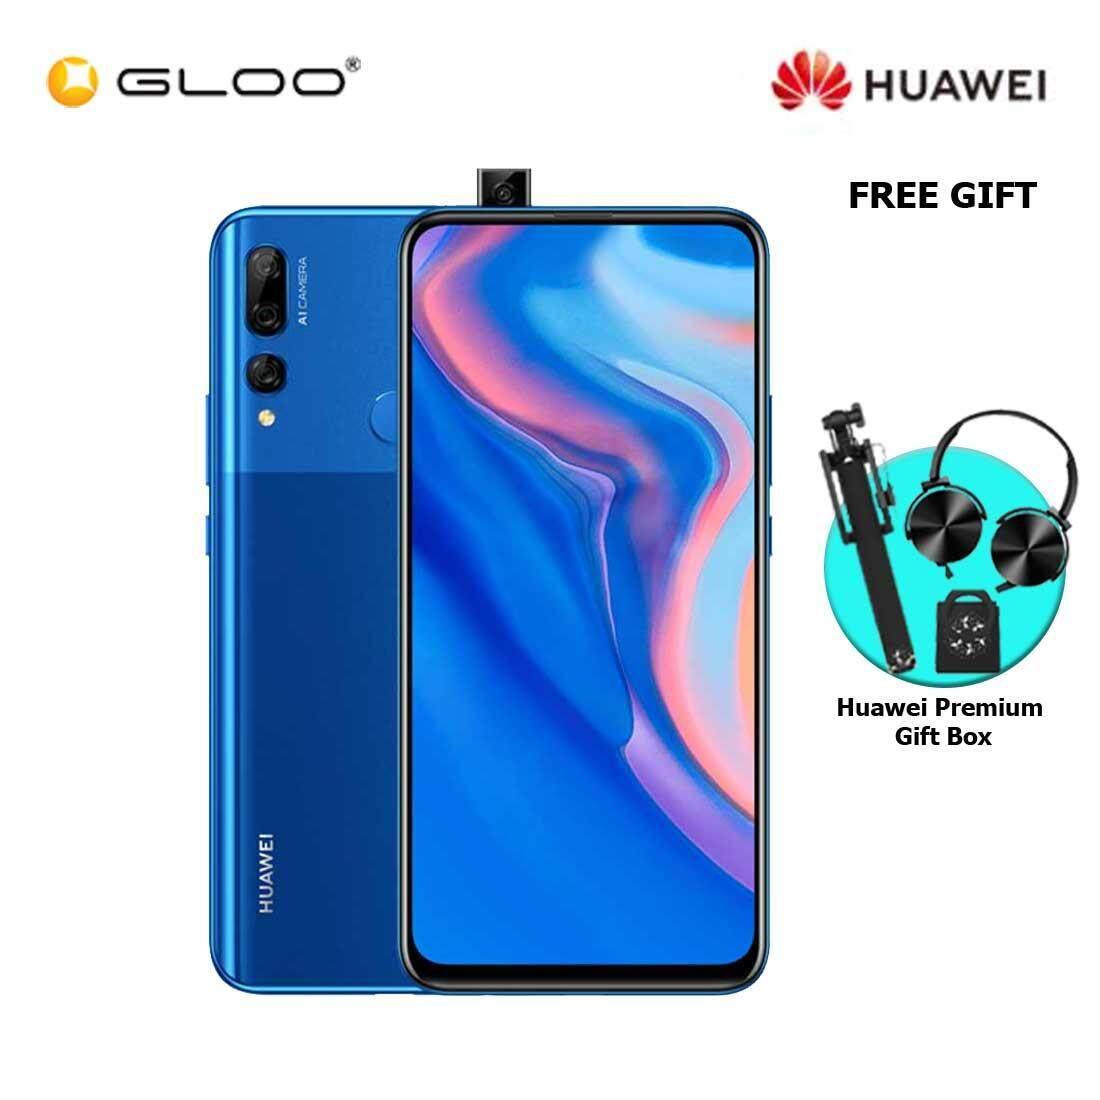 Huawei Y9 Prime 2019 4GB+128GB Sapphire Blue + FREE Premium Gift Box (Headset/Selfie Stick/iRing)